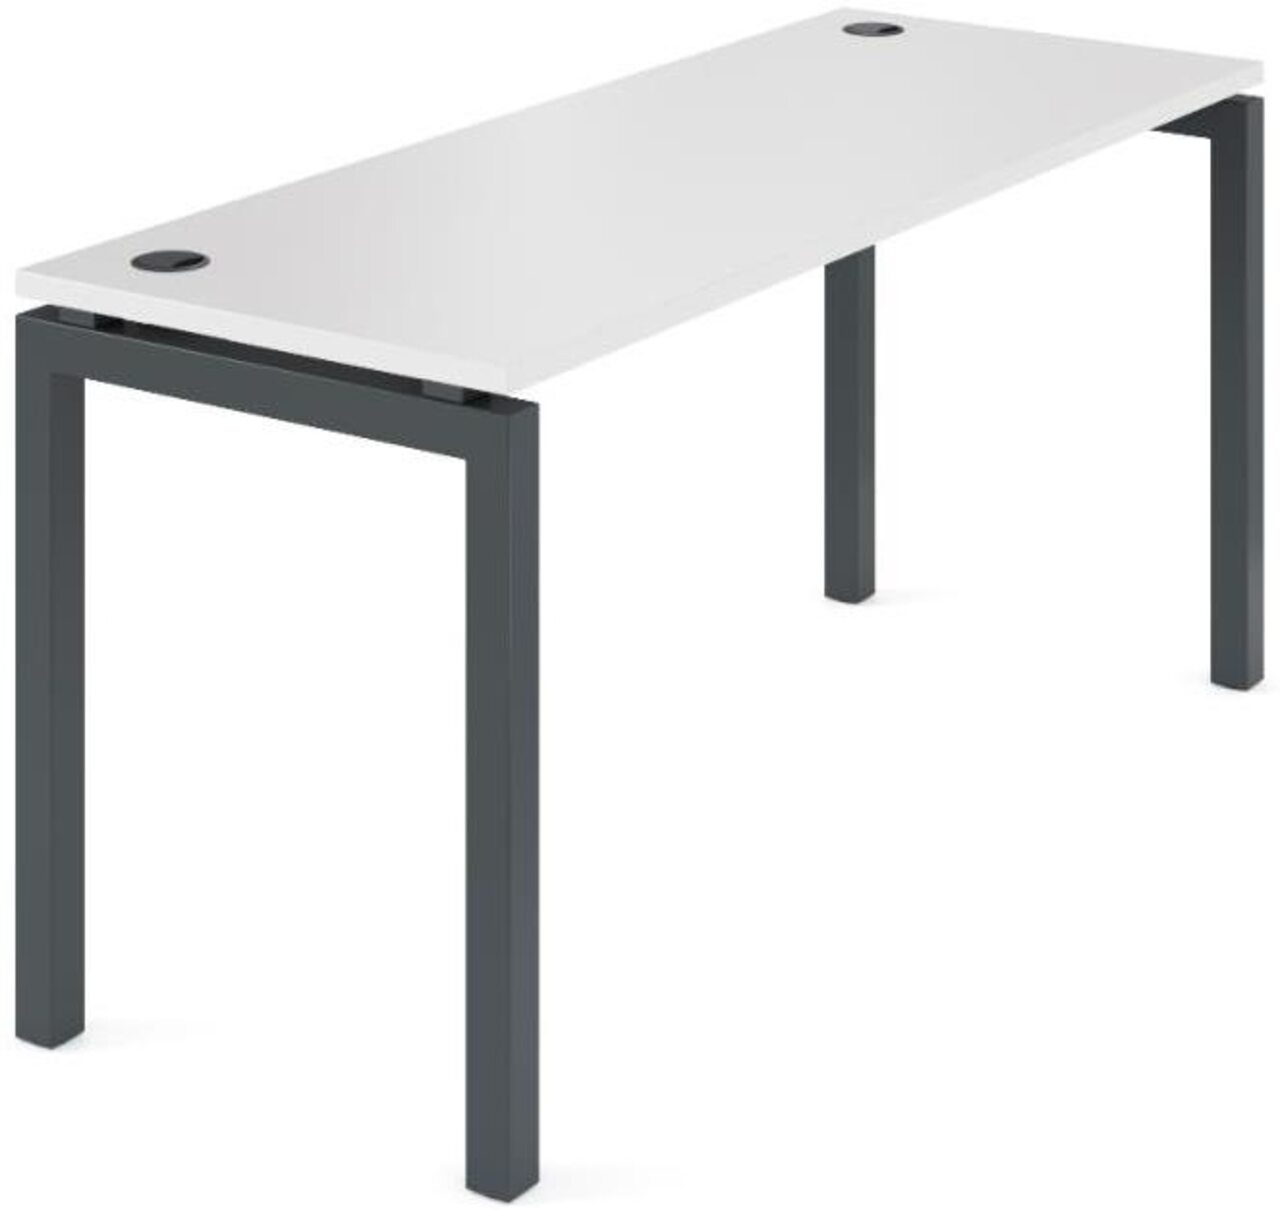 Стол на металлокаркасе  Арго 160x60x76 - фото 4